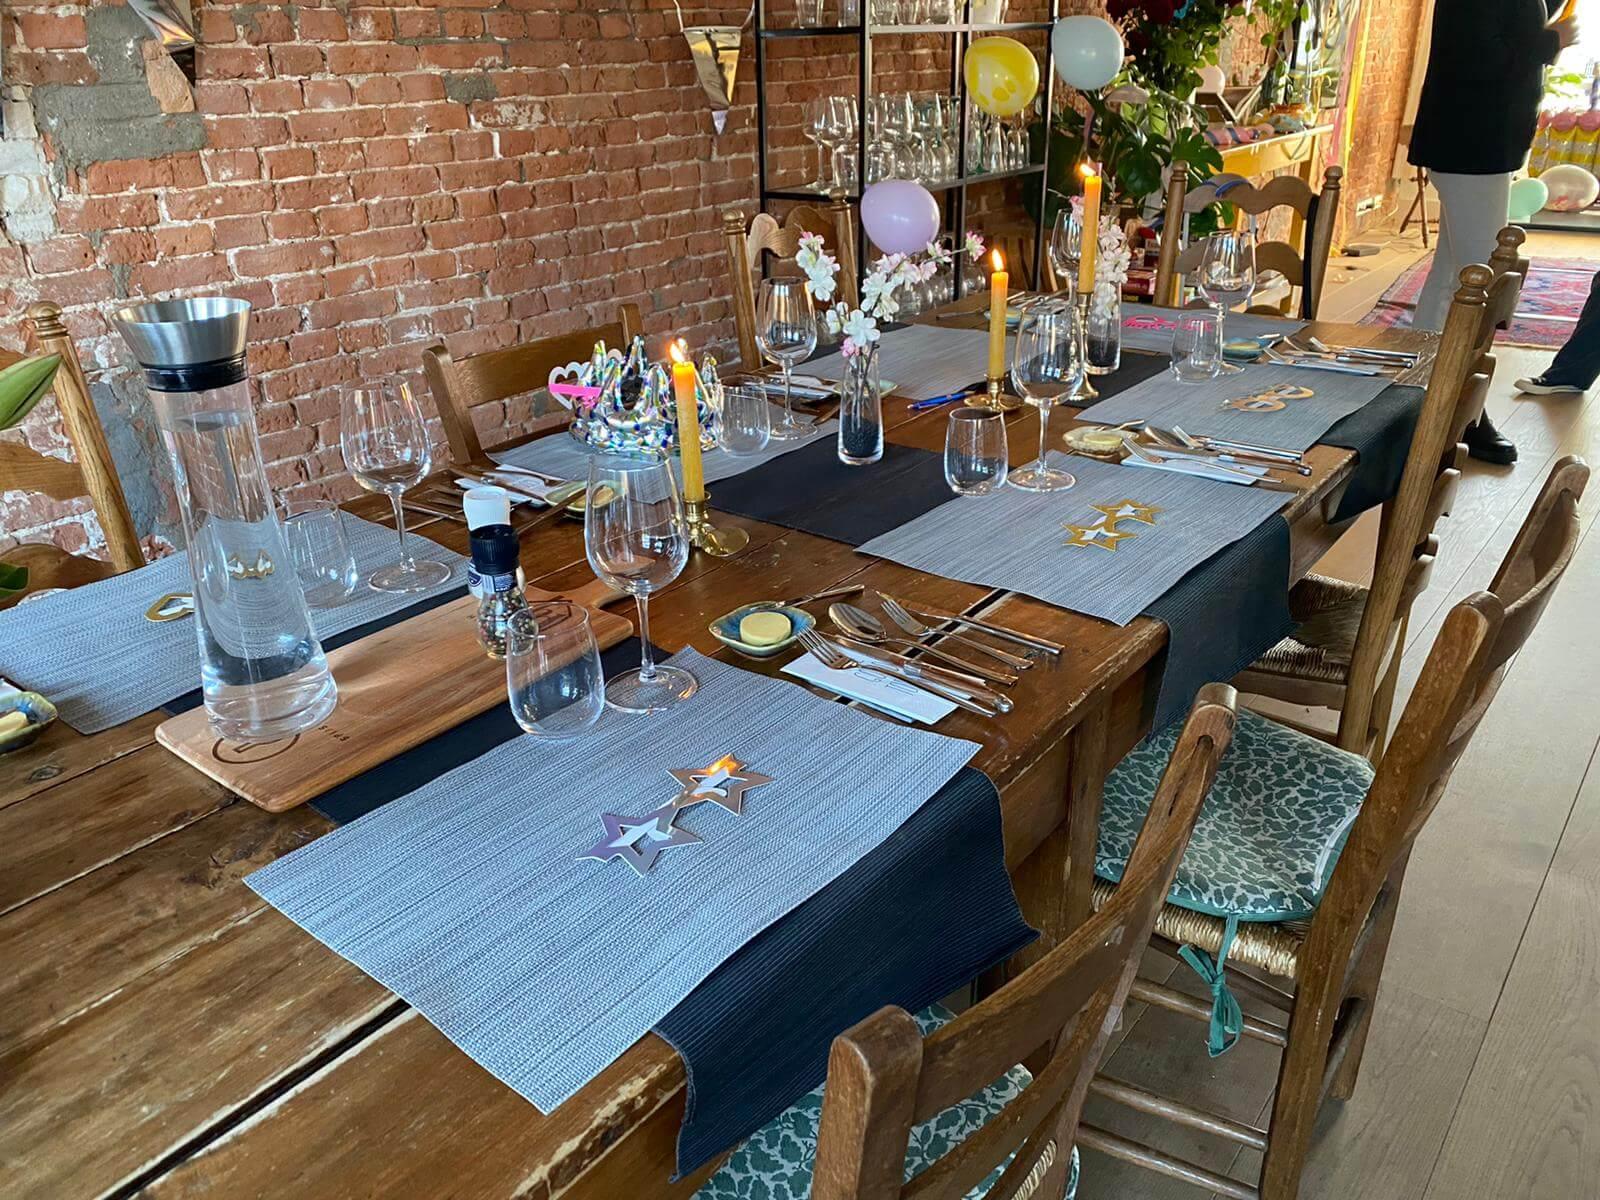 Opgedekte tafel met kaarsen en placemats